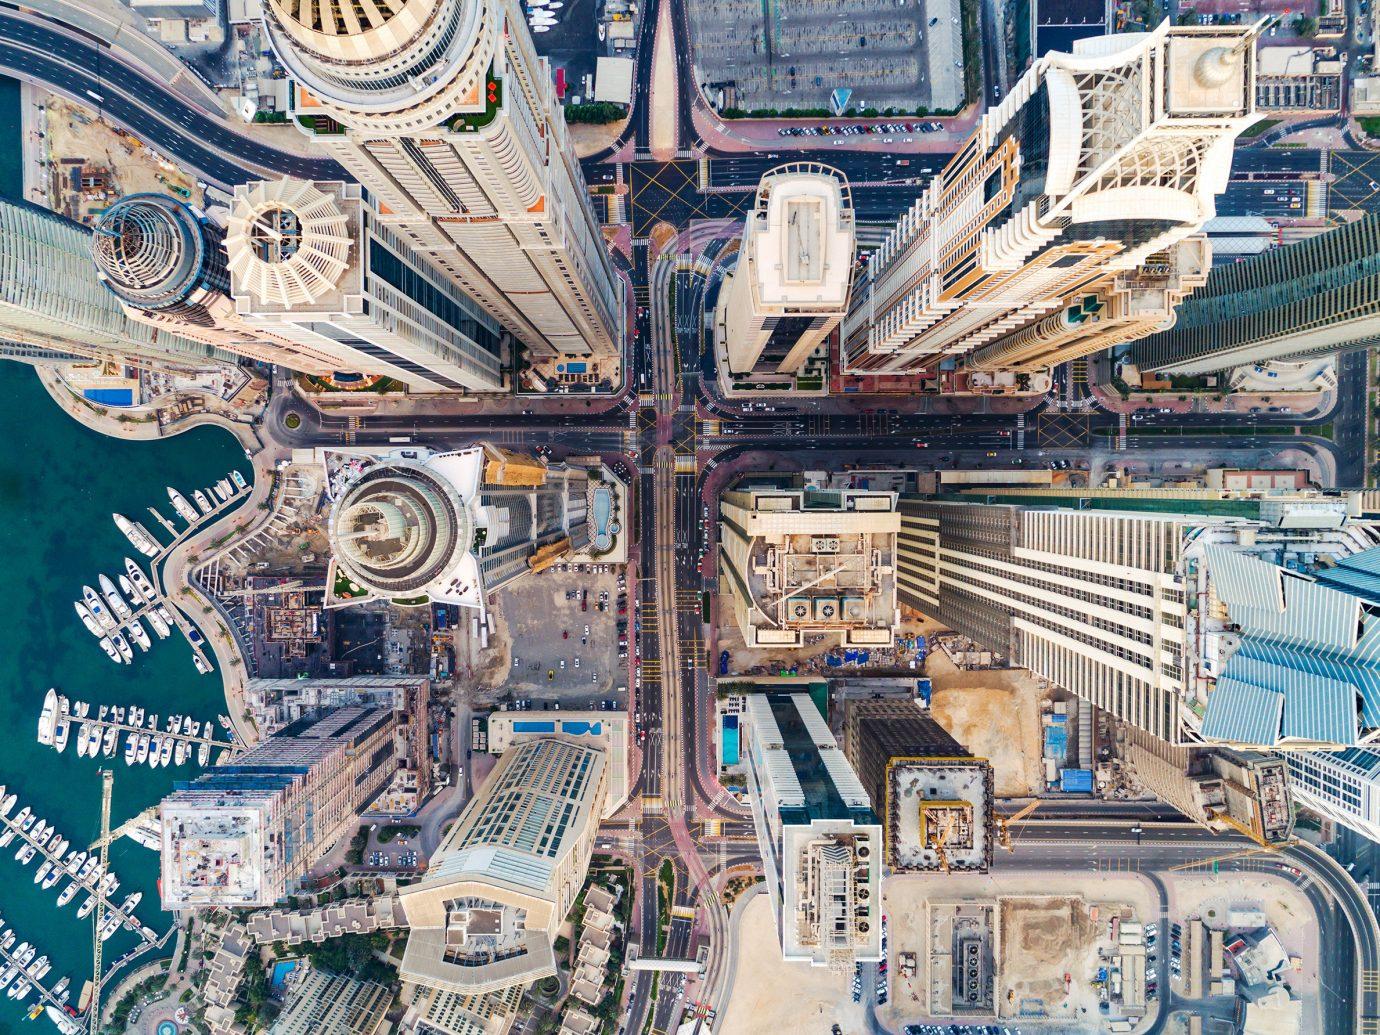 metropolis landmark urban area City metropolitan area bird's eye view cityscape aerial photography urban design building engineering